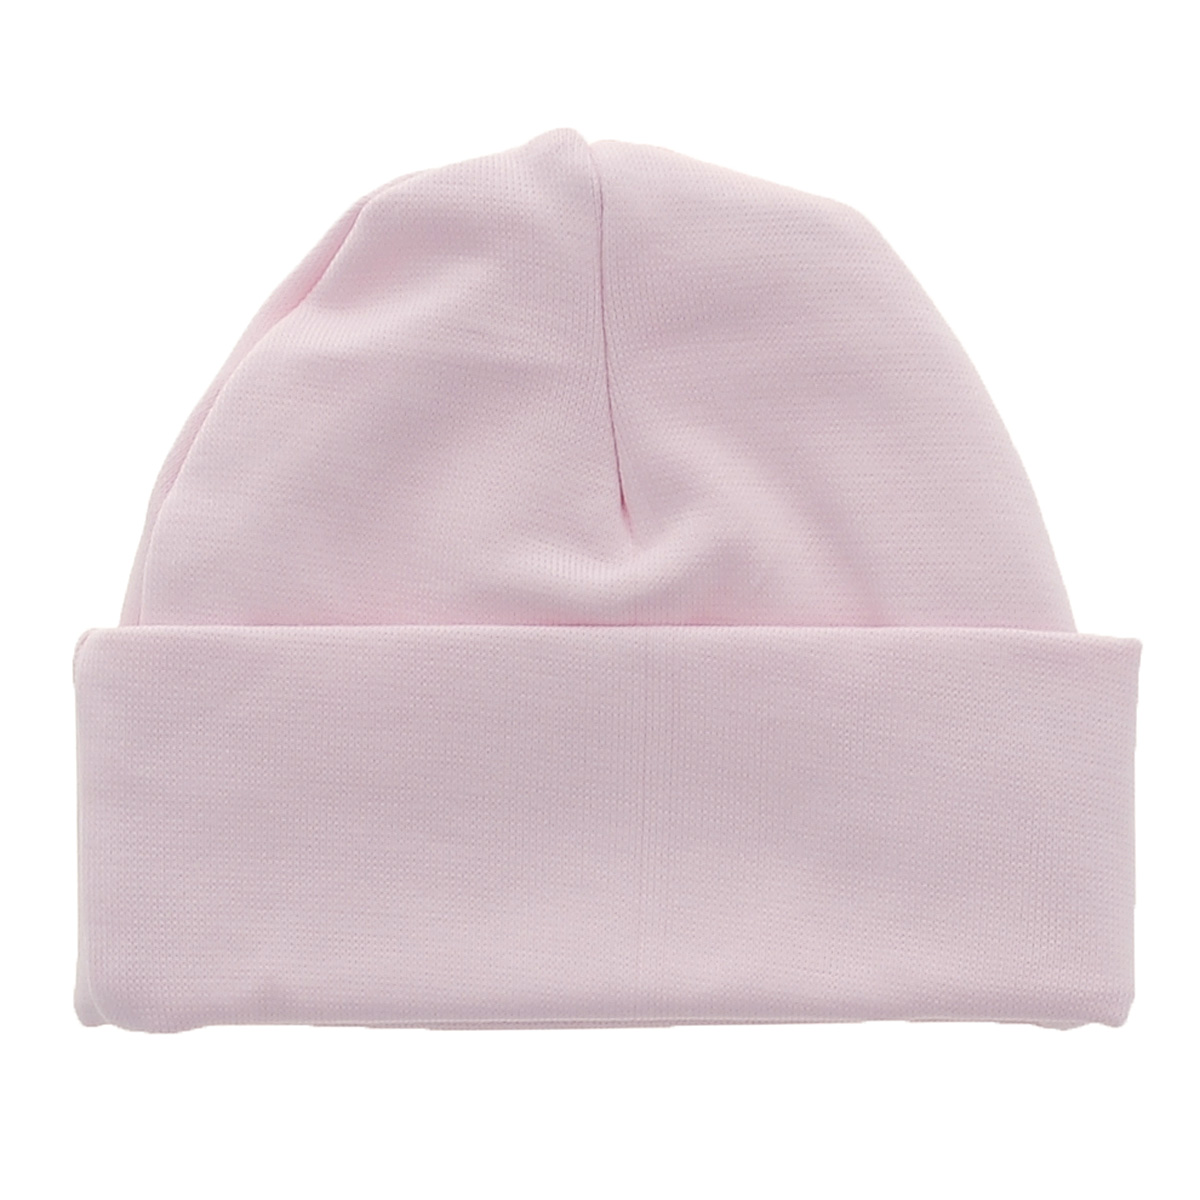 Шапочка для девочки Lucky Child, цвет: светло-розовый. 2-9. Размер 47